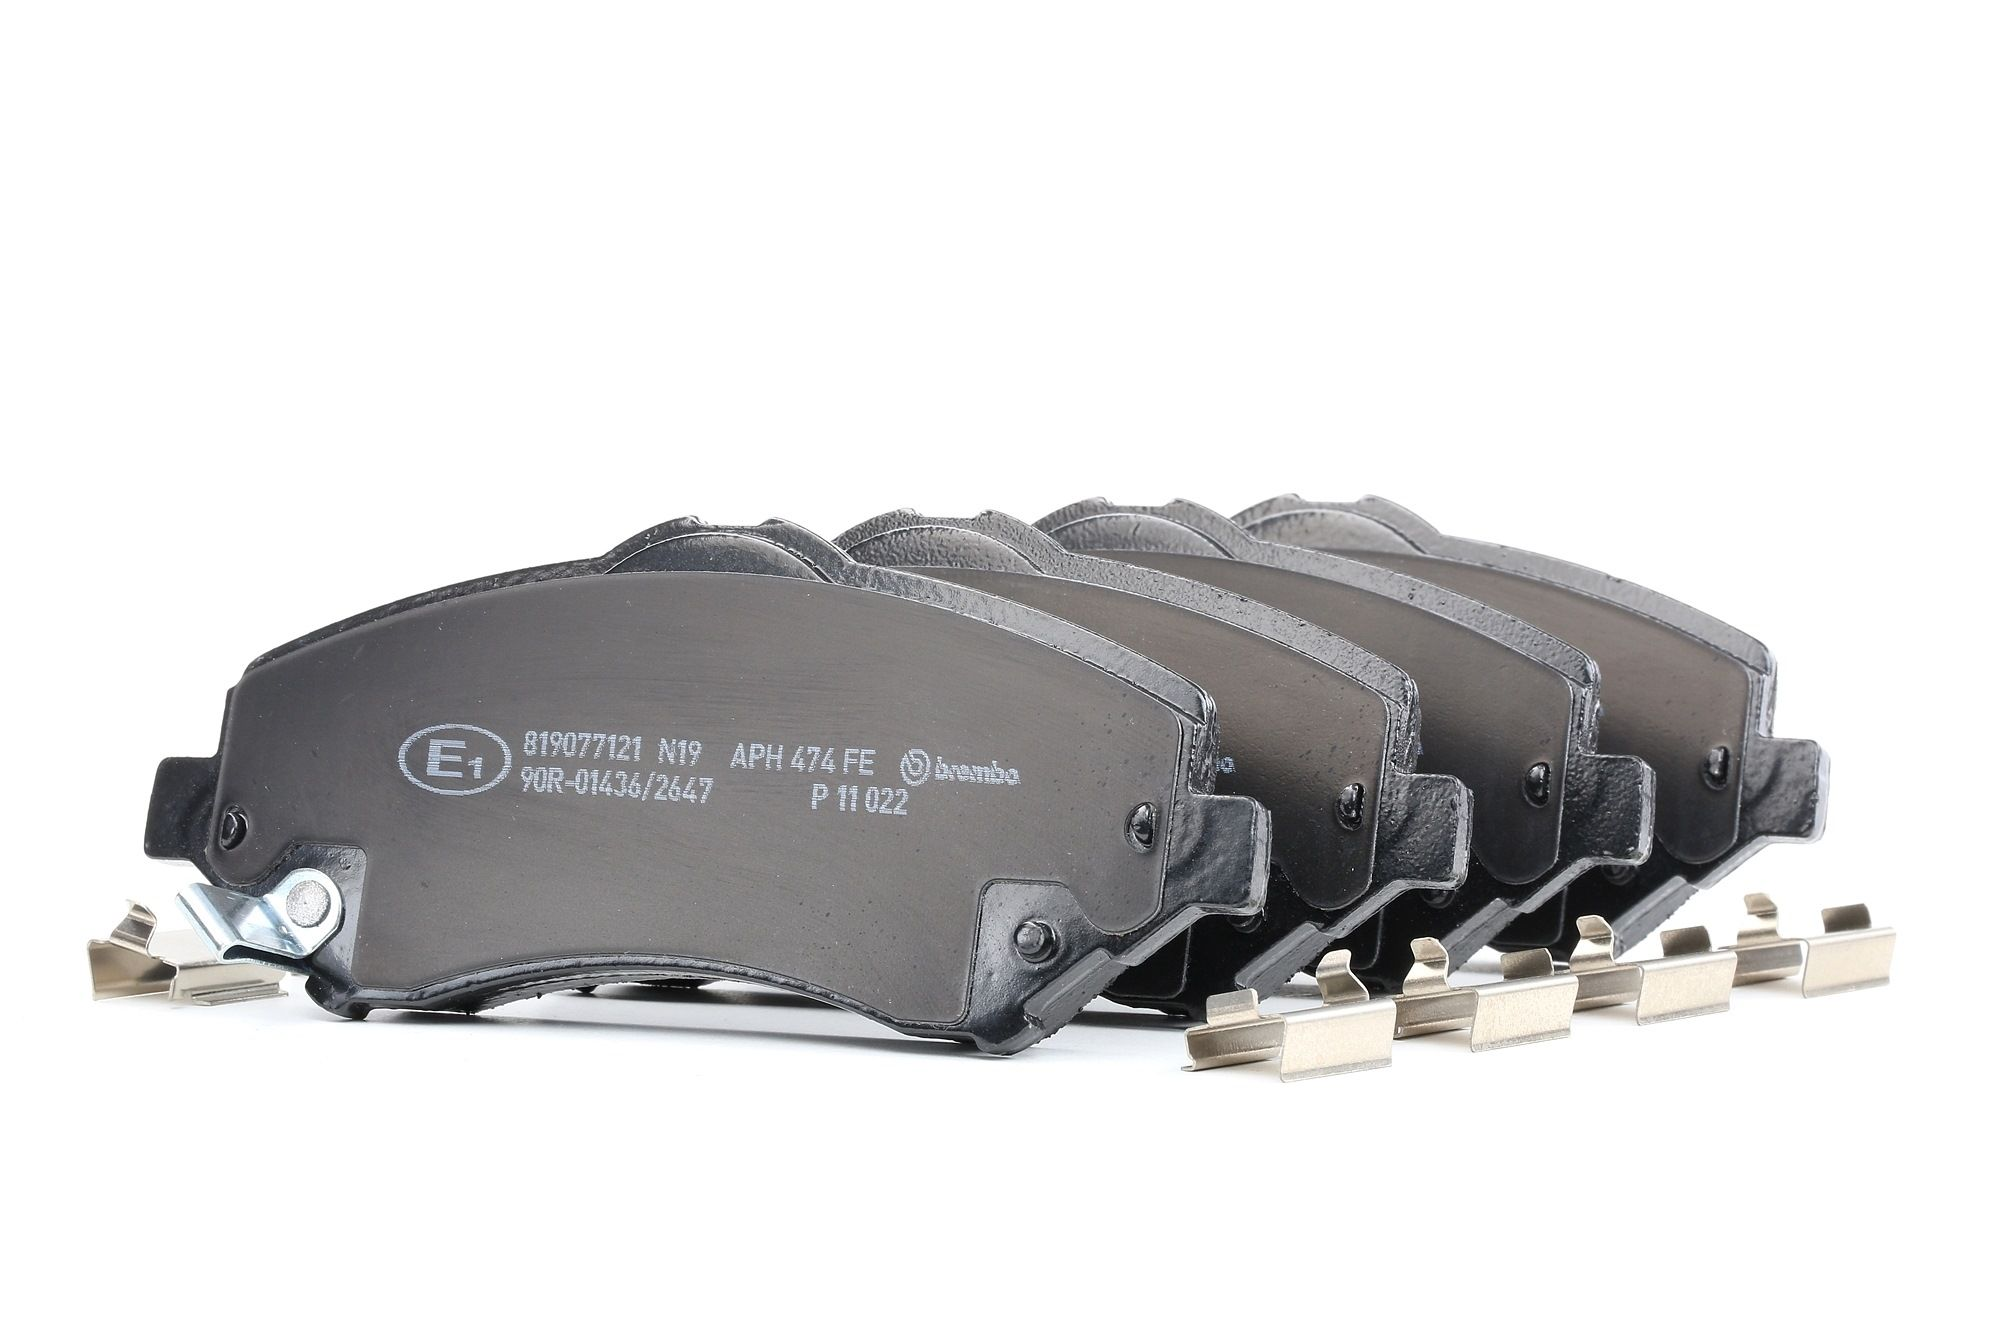 JEEP WRANGLER 2020 Bremsbelagsatz - Original BREMBO P 11 022 Höhe: 63,4mm, Breite: 146,6mm, Dicke/Stärke: 17,5mm